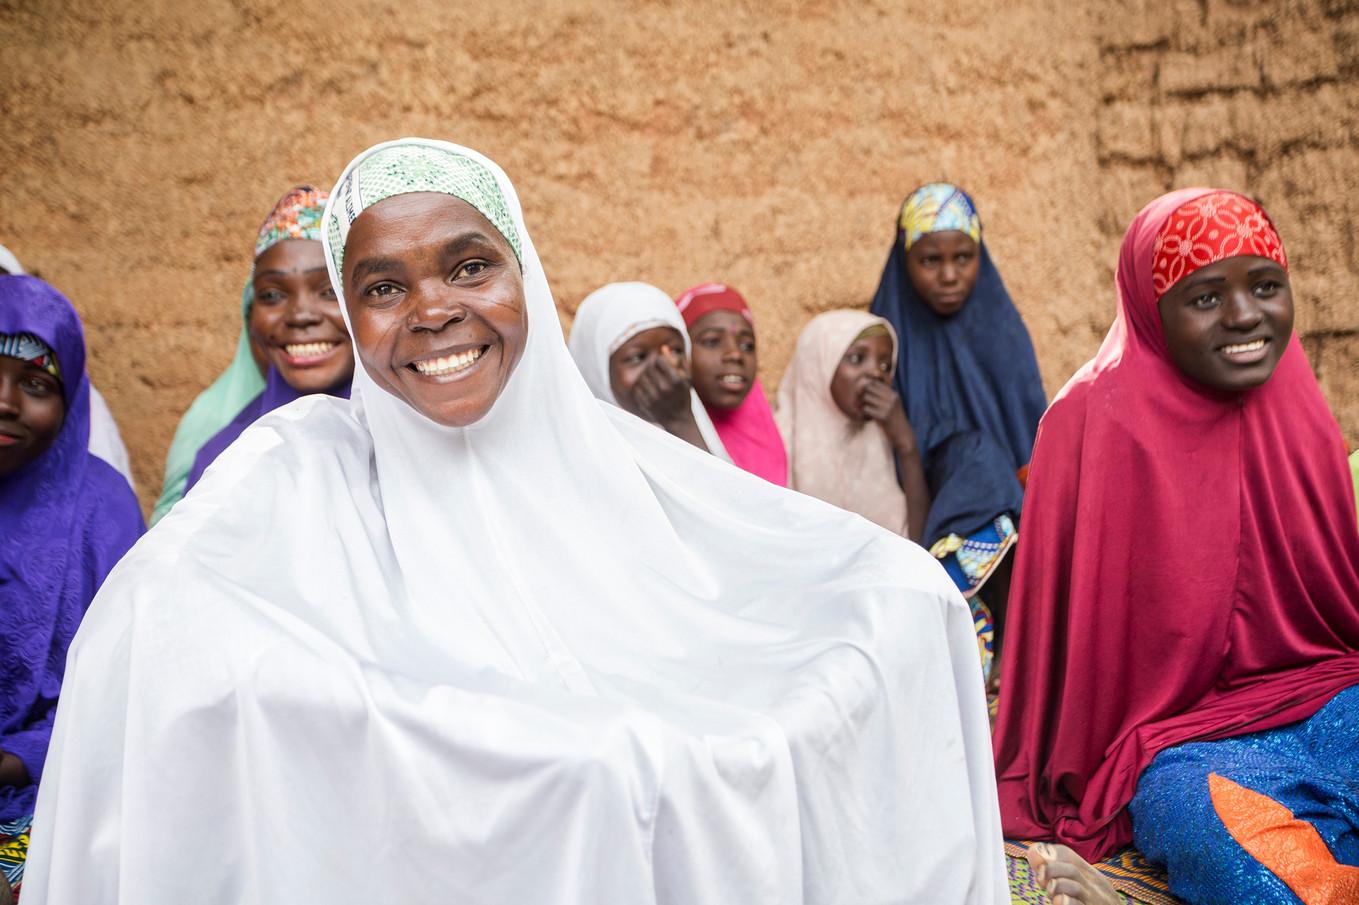 NGO_CSR-CARE-Niger 020.jpg